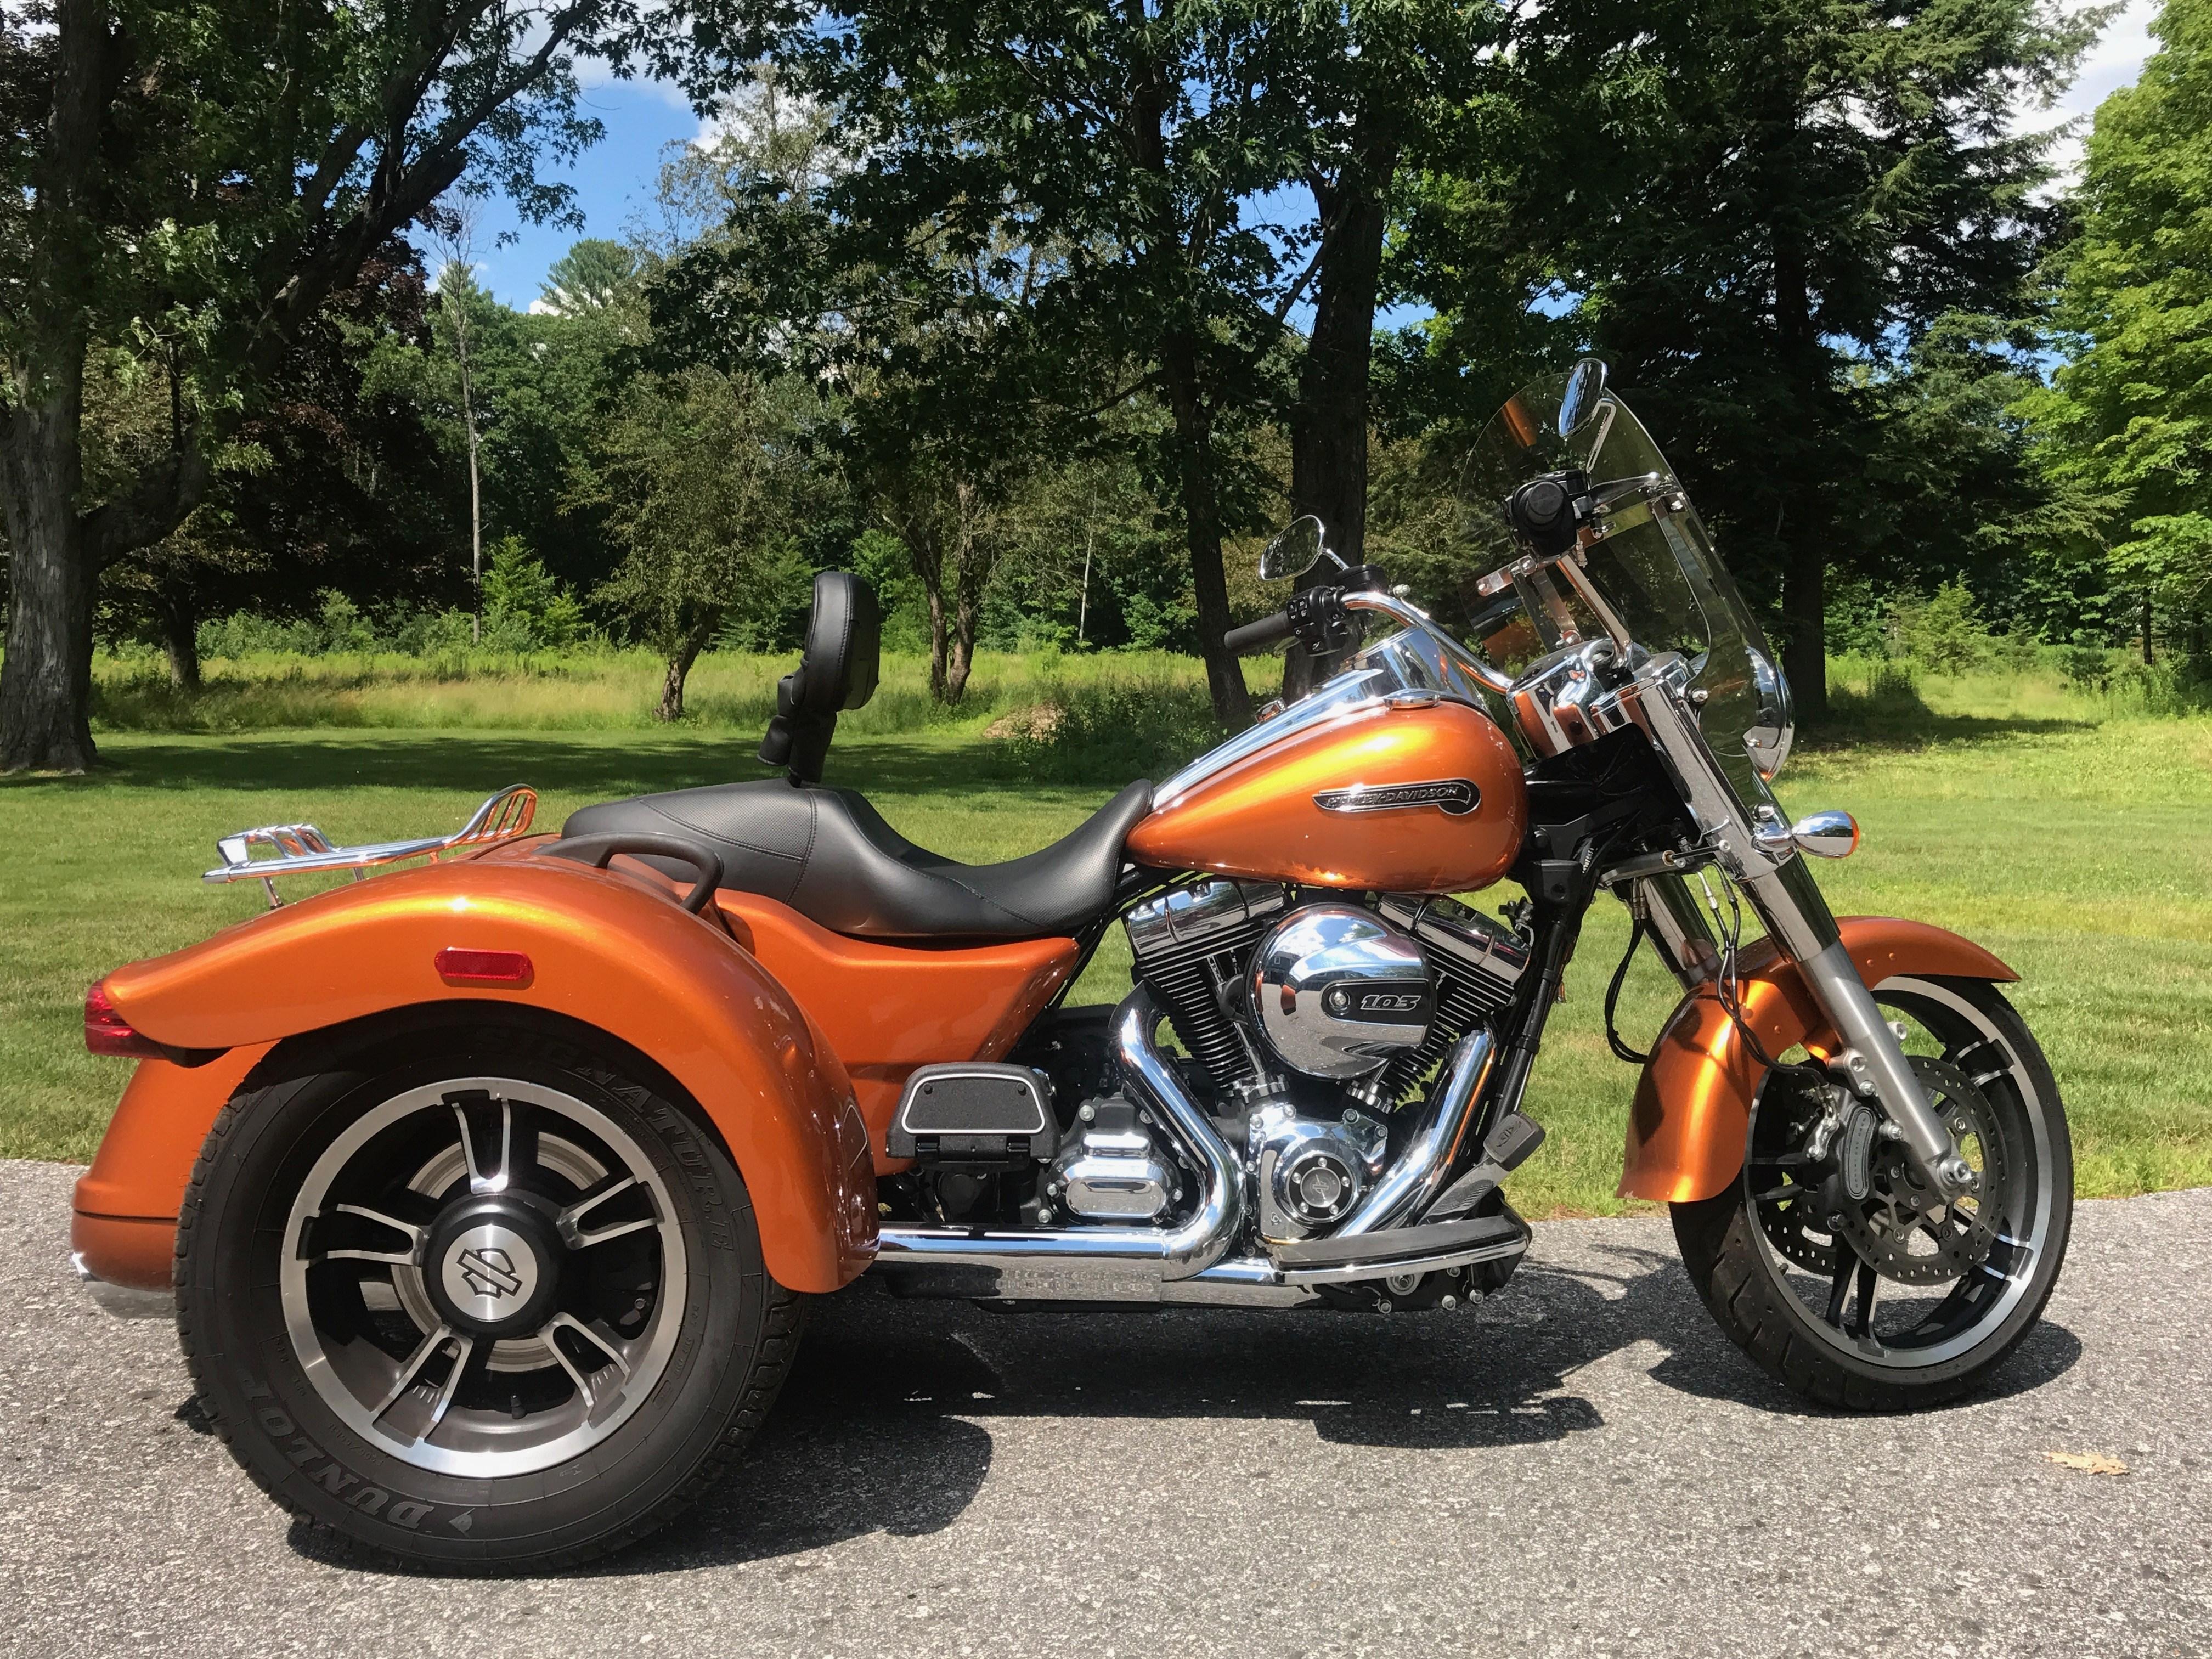 Used Harley Davidson Motorcycles For Sale San Marcos Tx >> 2015 Harley-Davidson® FLRT Freewheeler™ (Whiskey orange), Standish, Maine (736699)   ChopperExchange